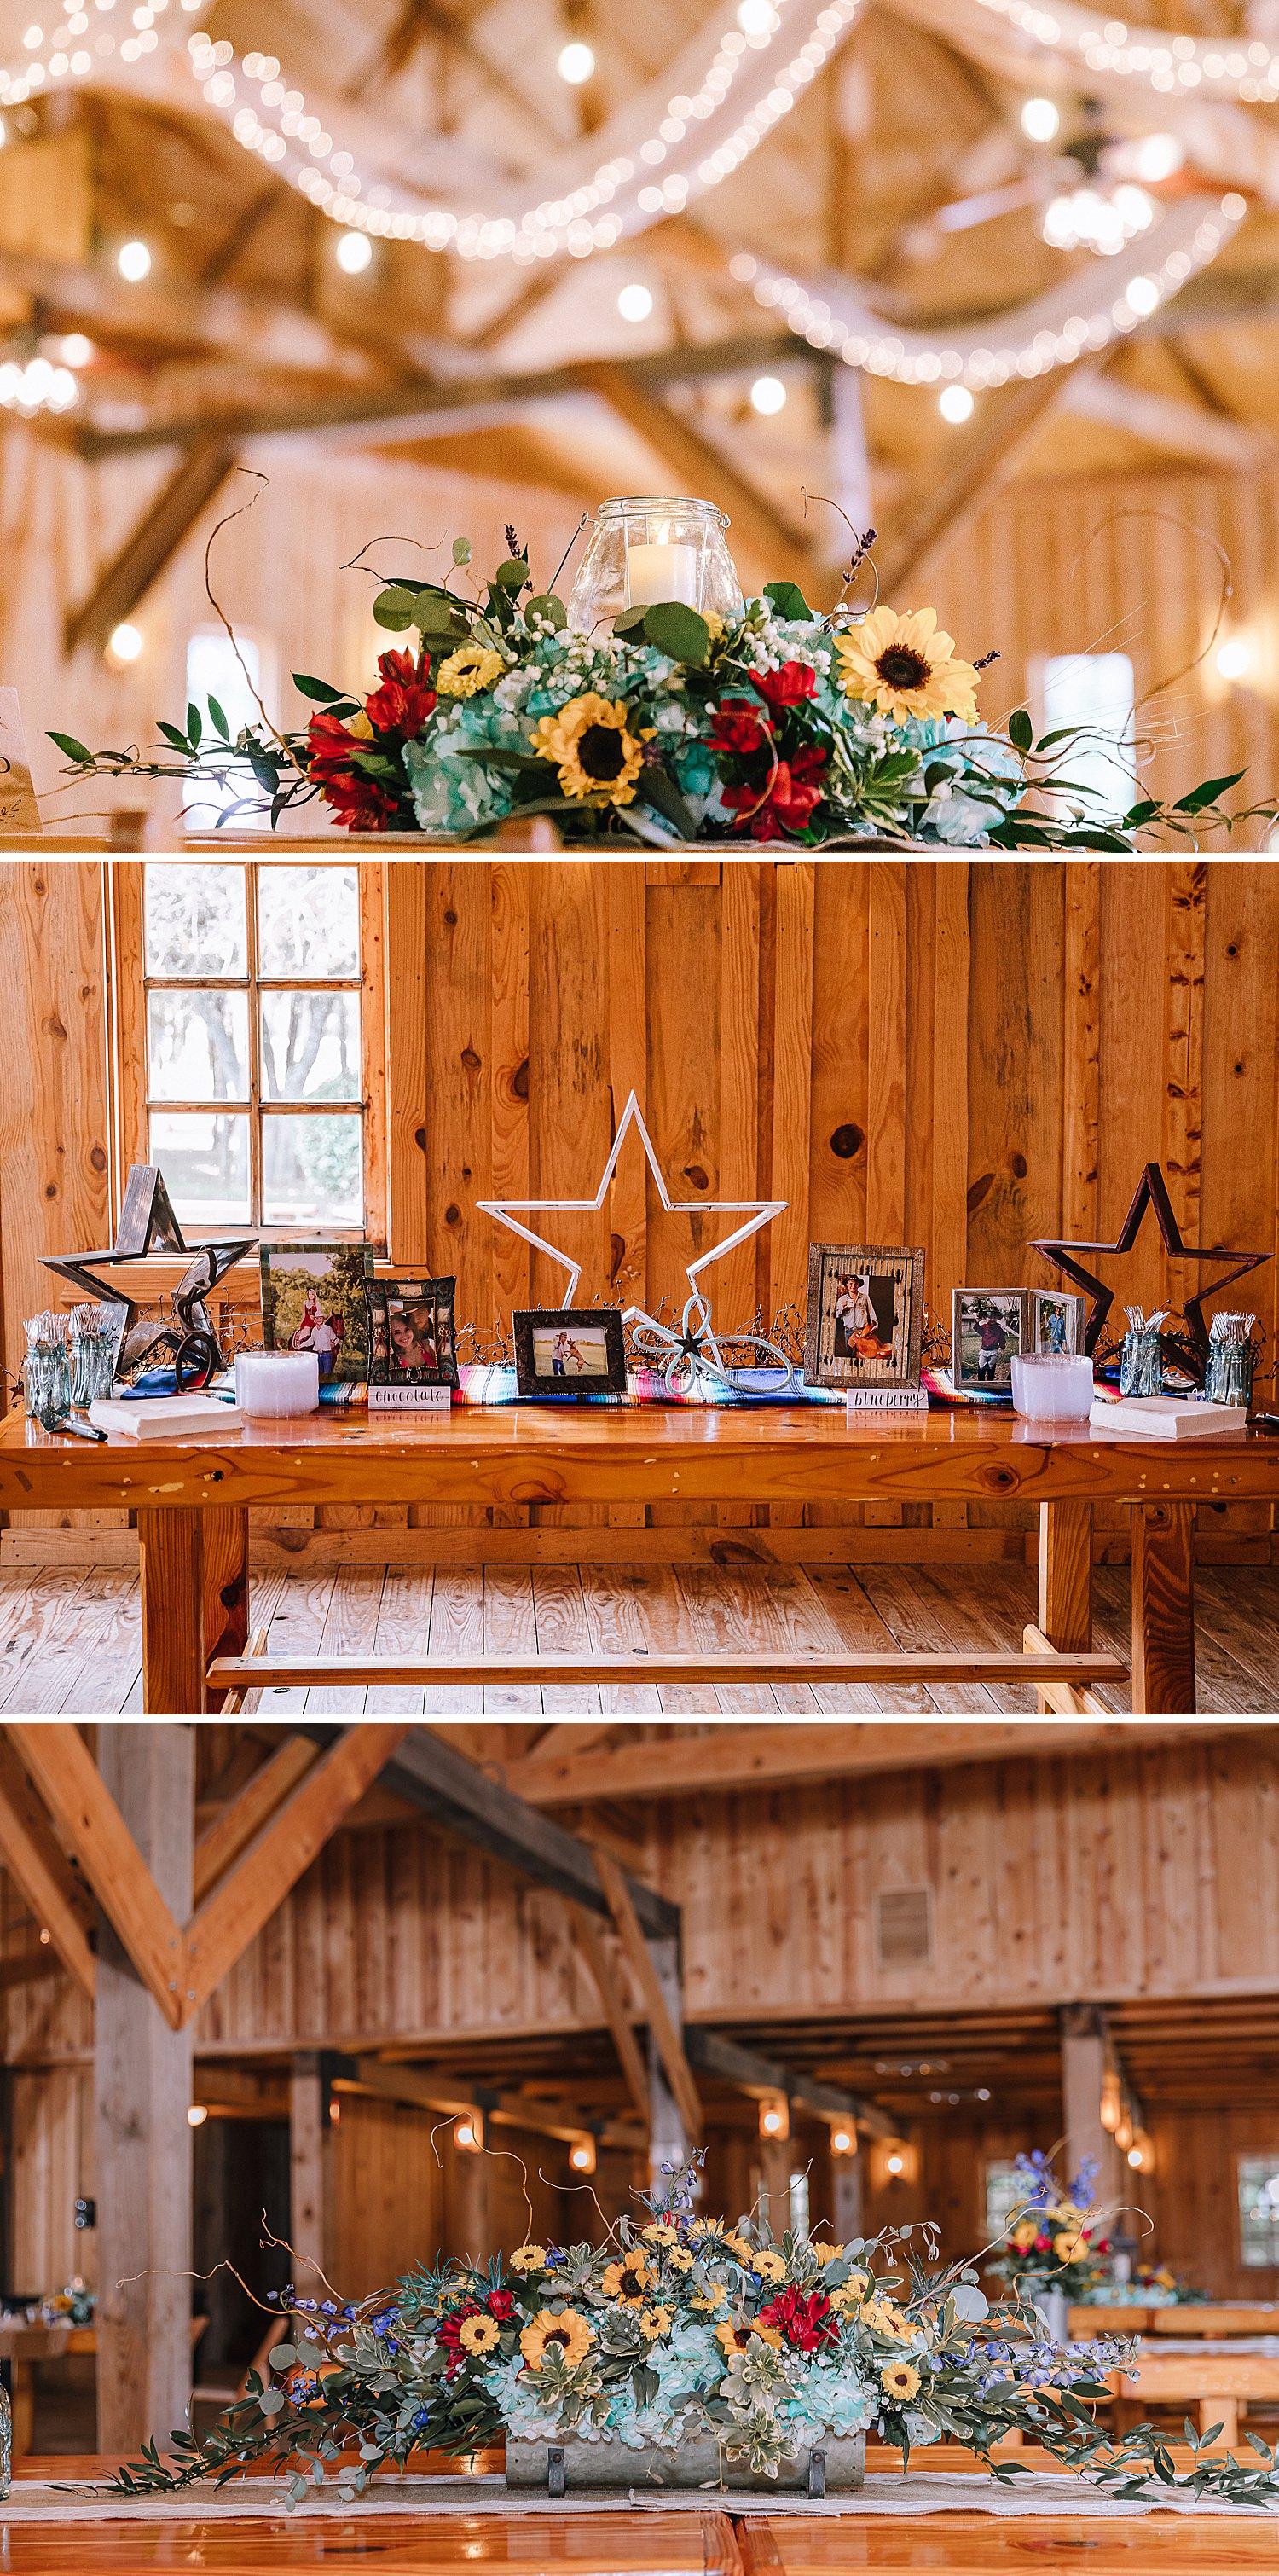 Carly-Barton-Photography-Old-Town-Texas-Rustic-Wedding-Photos-Sunflowers-Boots-Kyle-Texas_0023.jpg